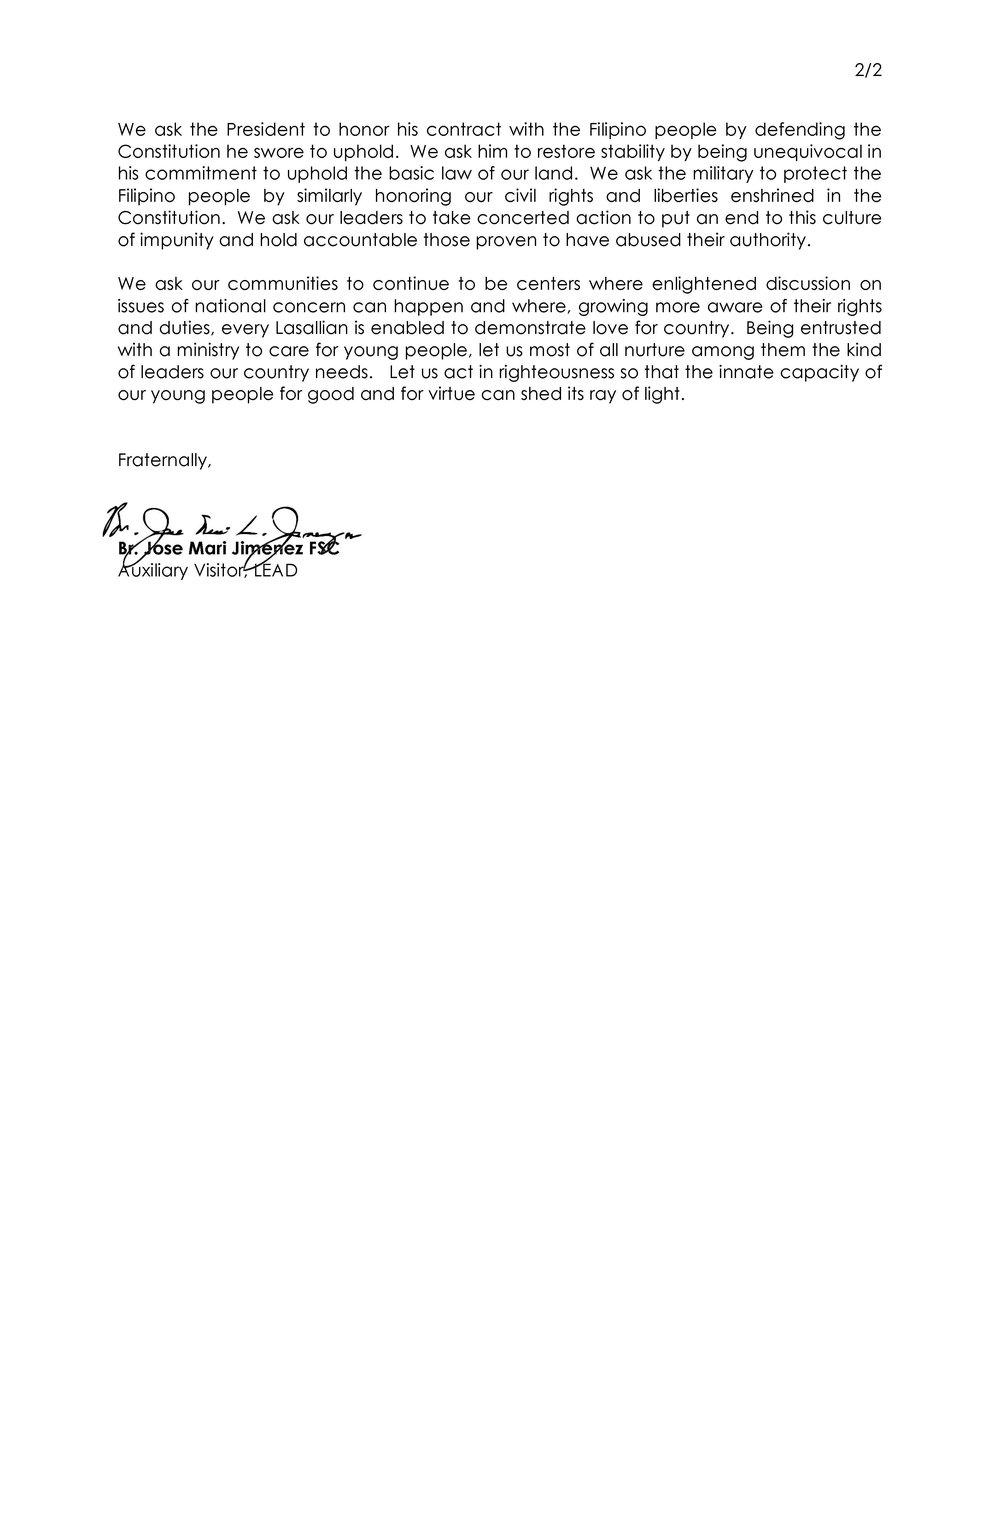 OAVC-1718-027_Pastoral Letter Bonifacio Day_Page_2.jpg